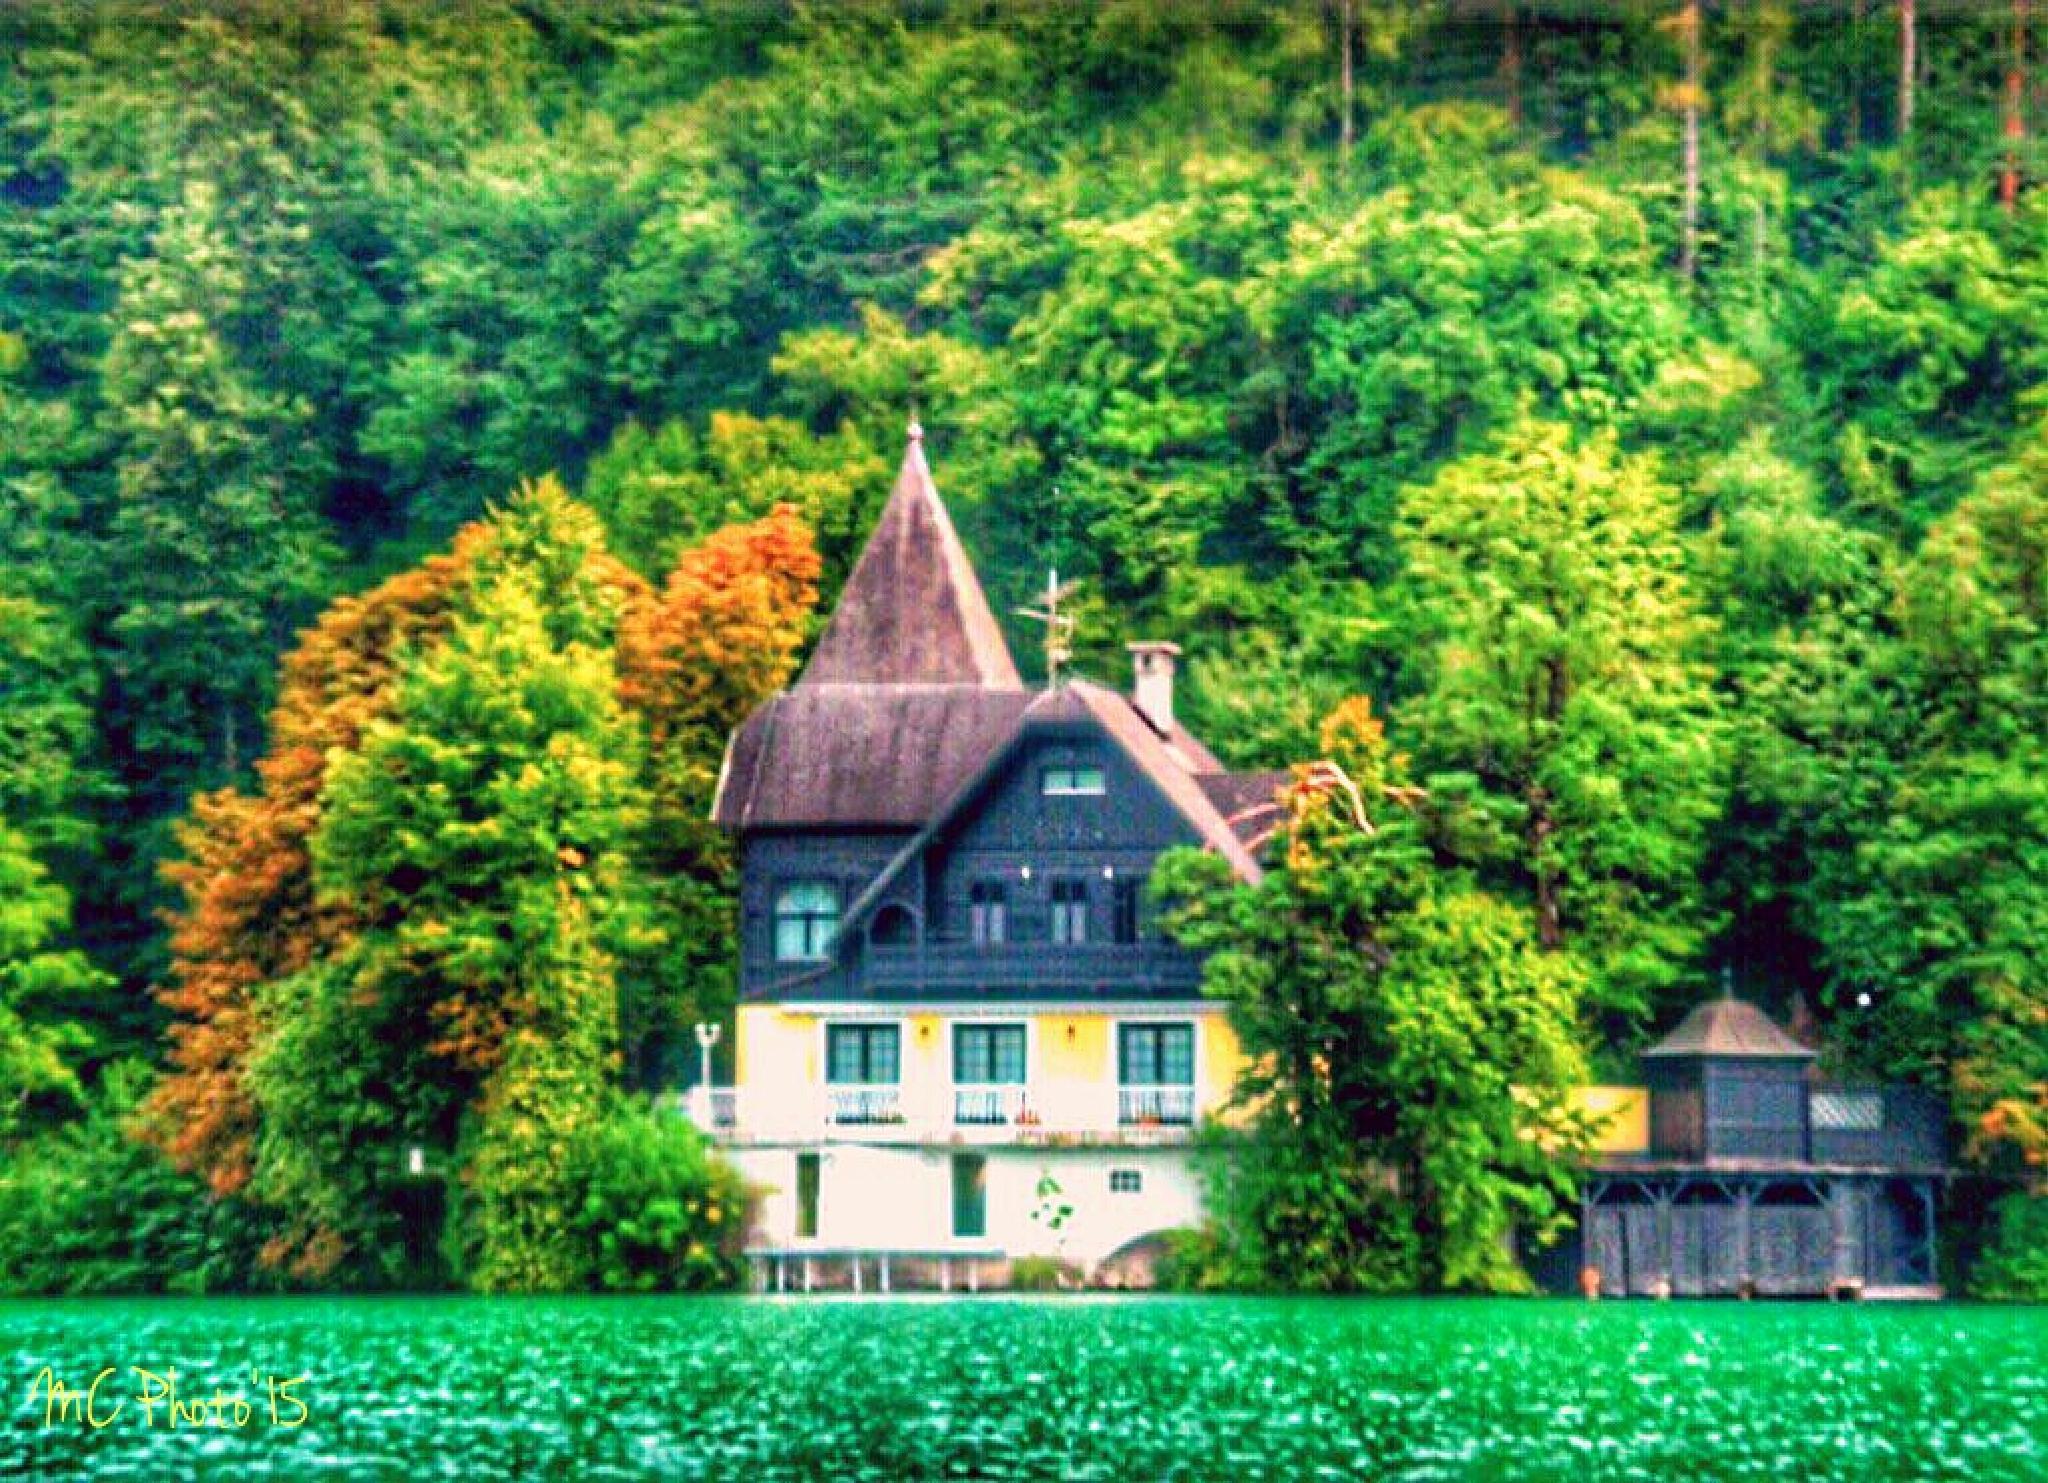 Lakehouse by Mario Cilia